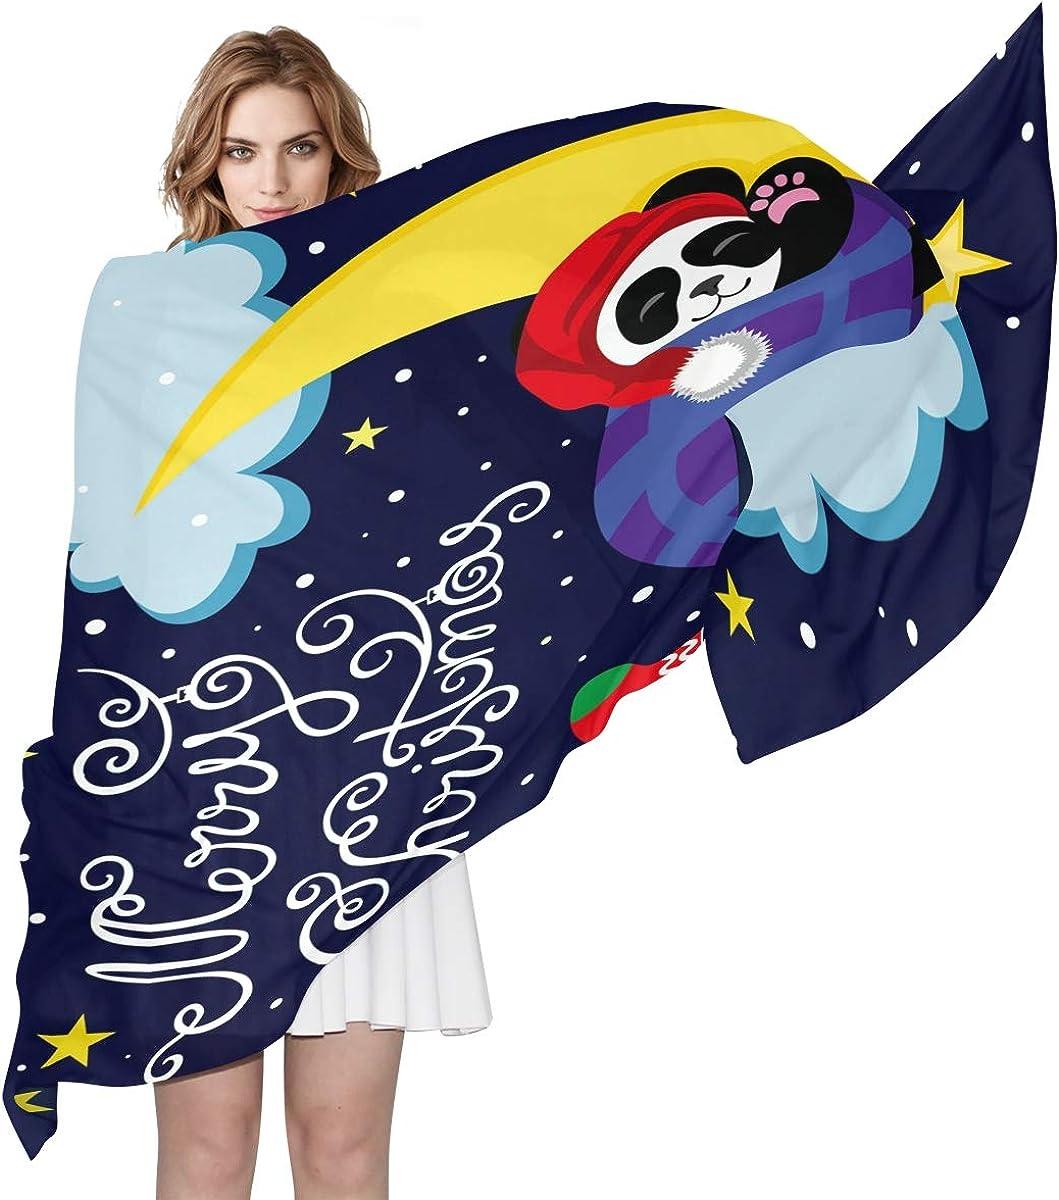 XLING Fashion Scarf Merry Christmas Animal Panda Star Long Lightweight Sunscreen Scarf Shawl Wrap Muffler Neckerchief for Women Men